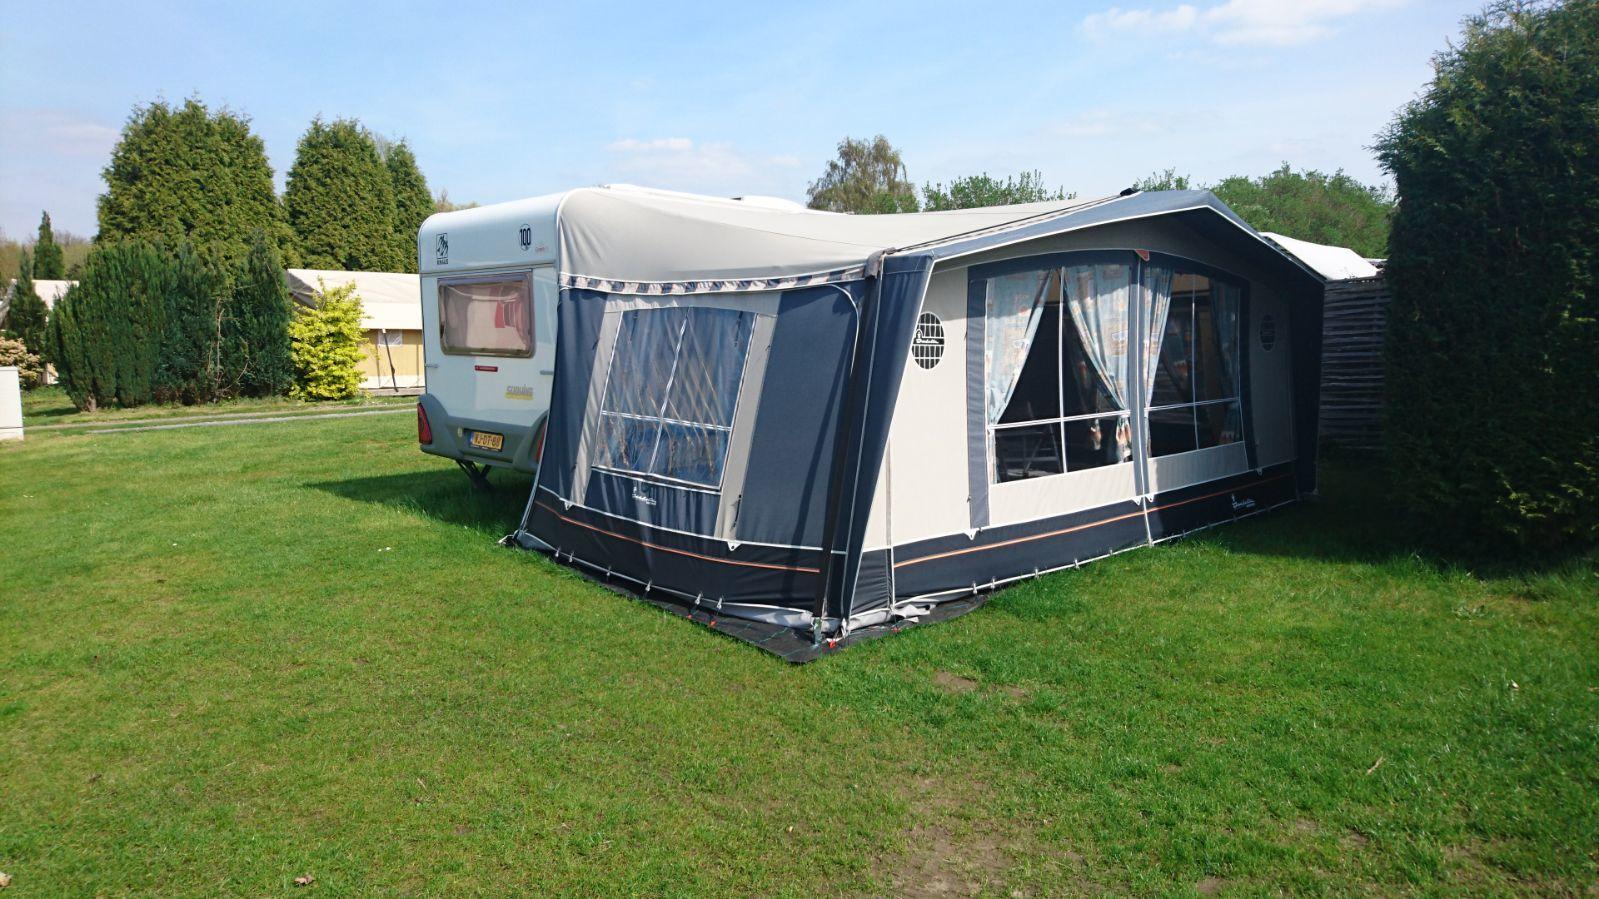 Duitsland-Borken%20Hoxfeld-Camping%20Borken%20am%20See-ExtraLarge Campings Duitsland